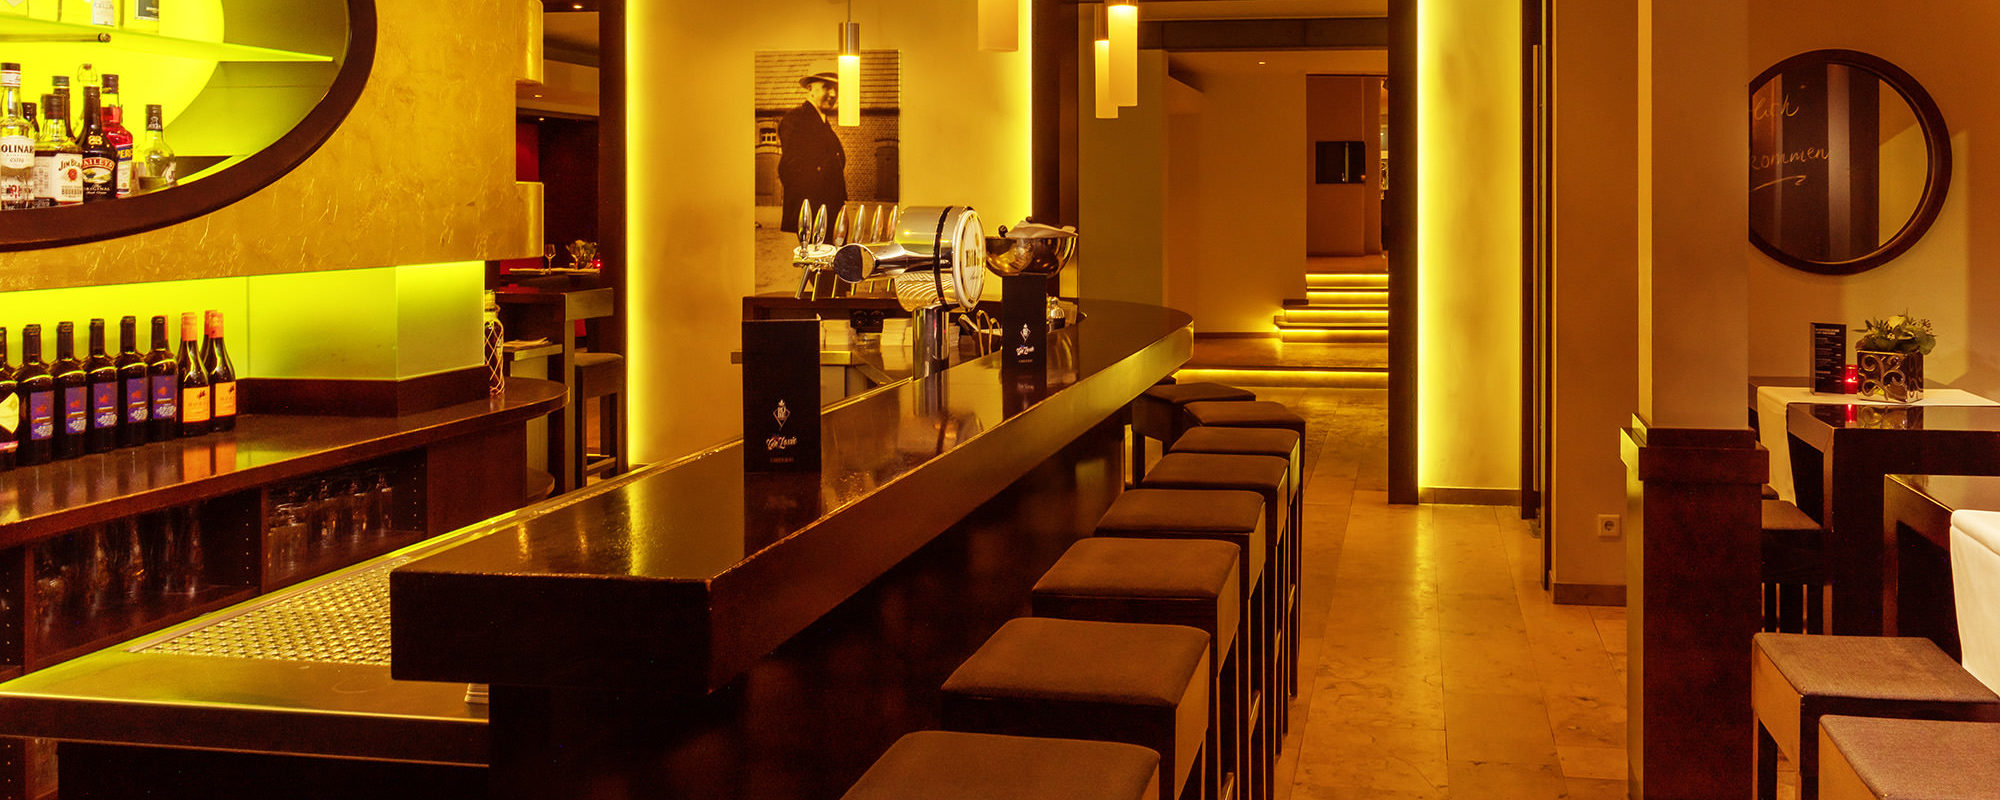 hotel-reckord-DSC9034